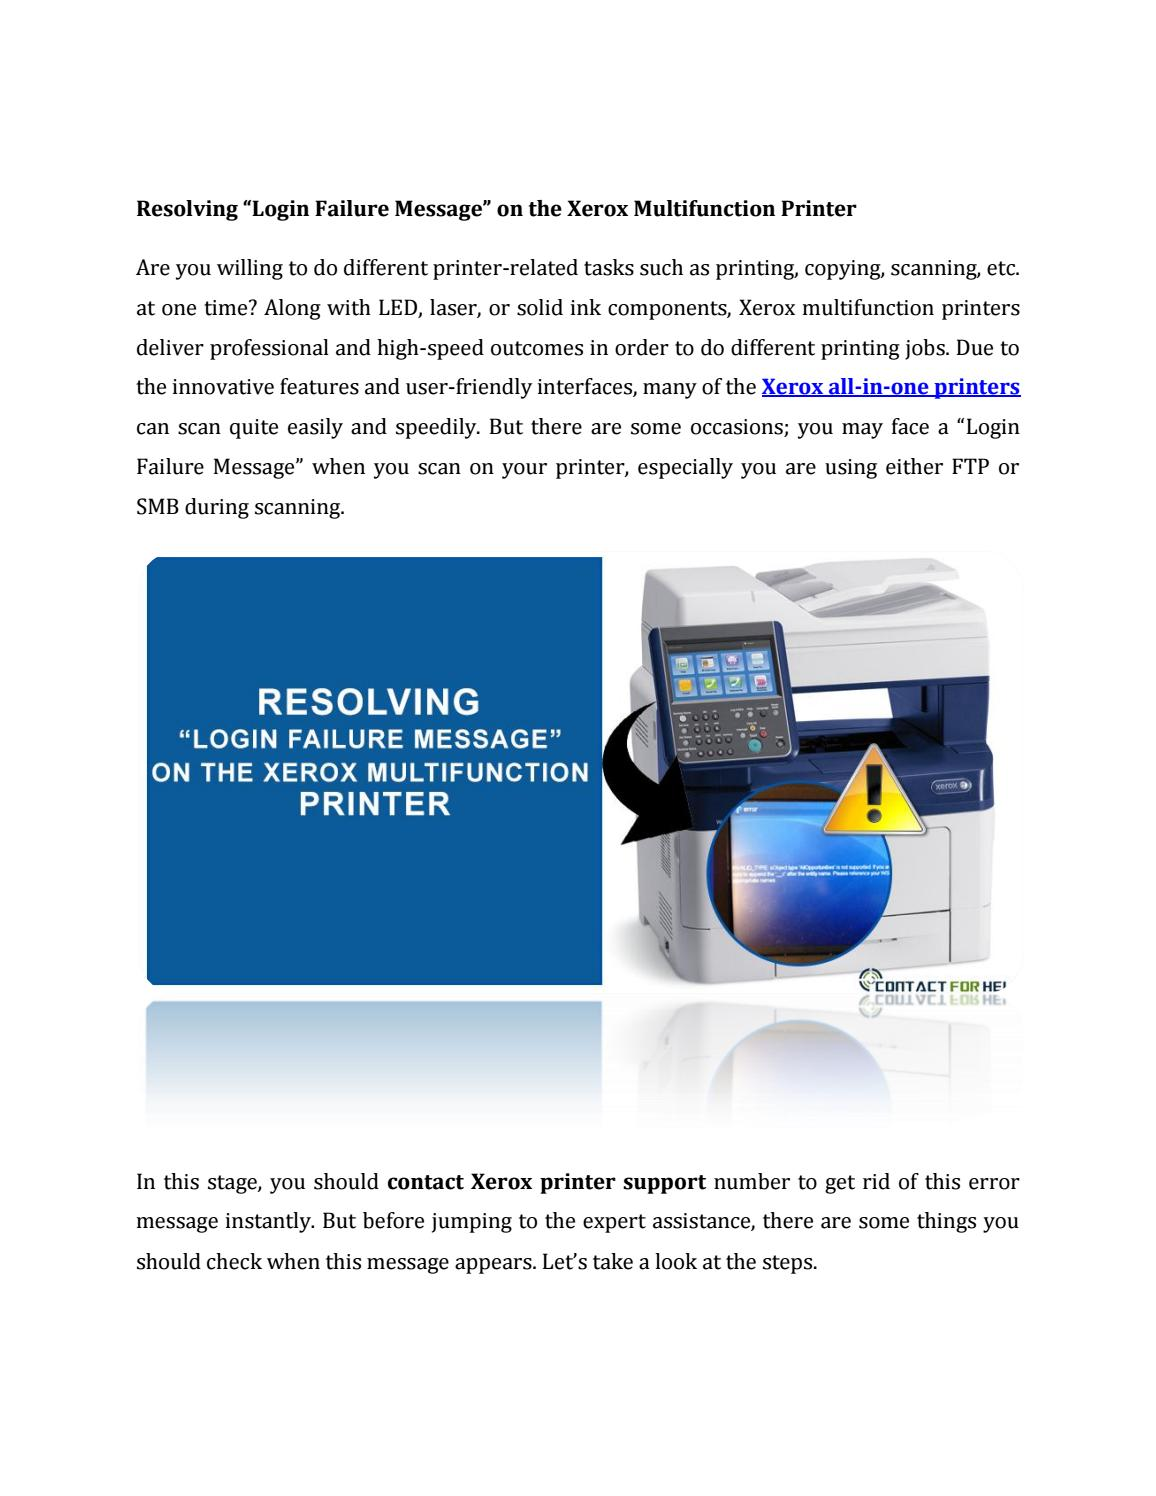 "Resolving ""Login Failure Message"" on the Xerox Multifunction"